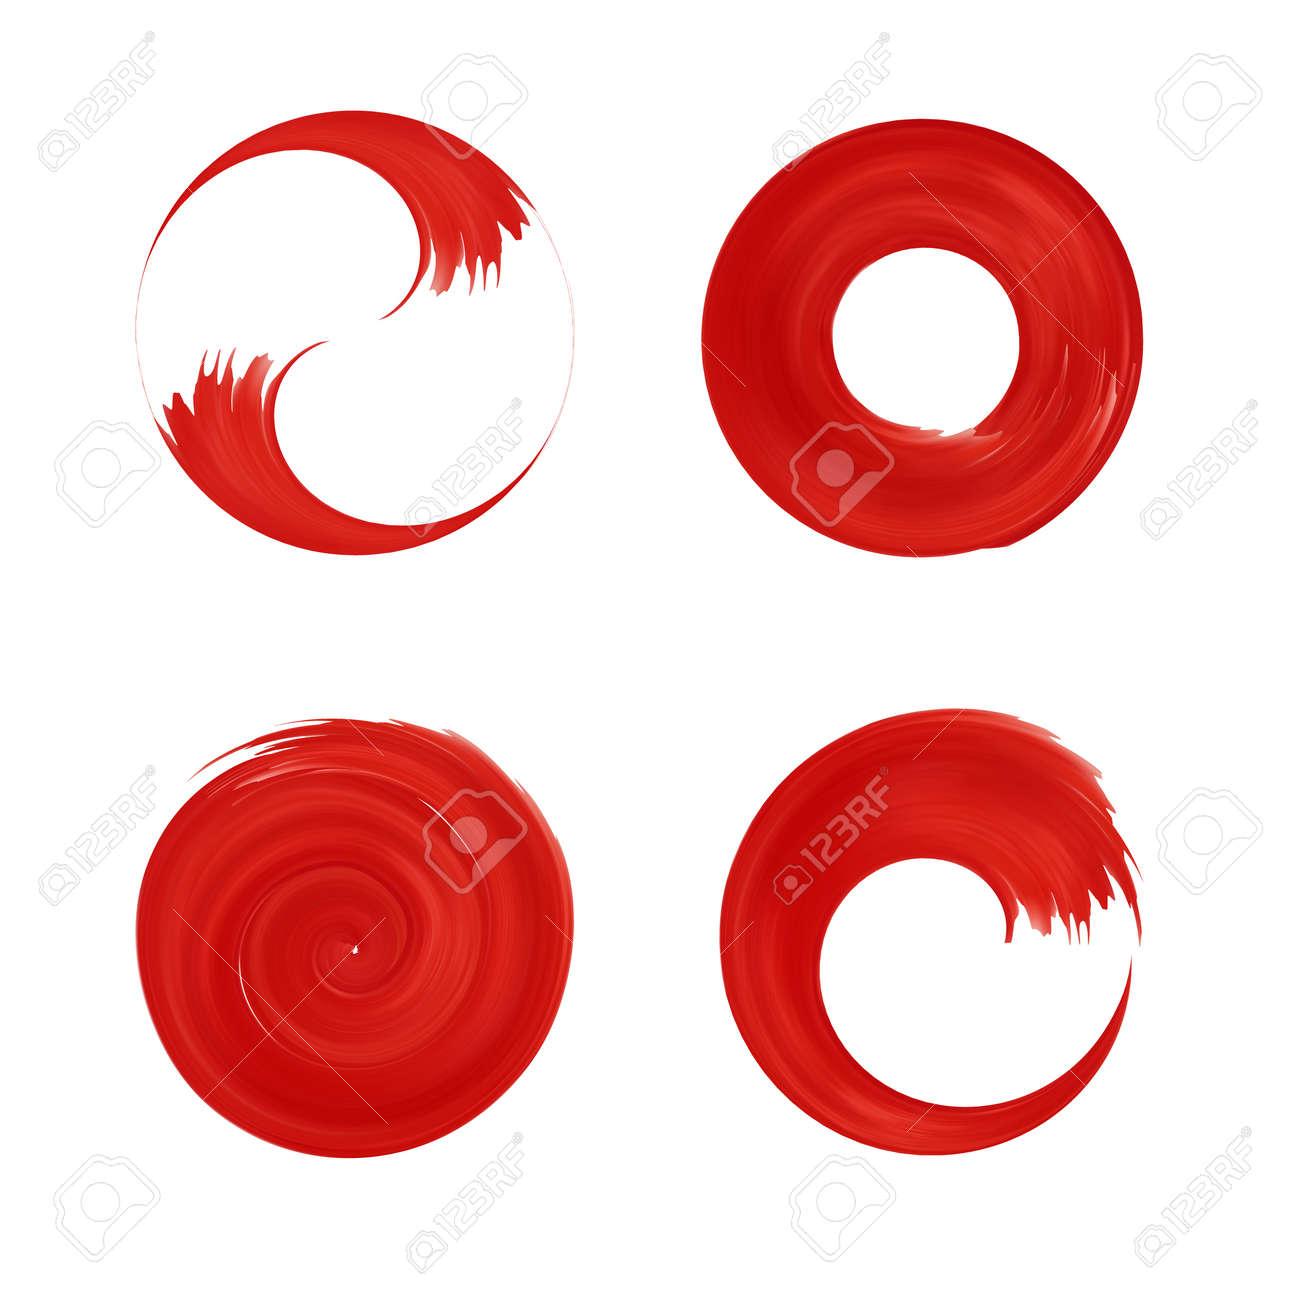 Set of red round element for design. Japan red circle. Logo templates. Brush stroke swirls . - 50930939